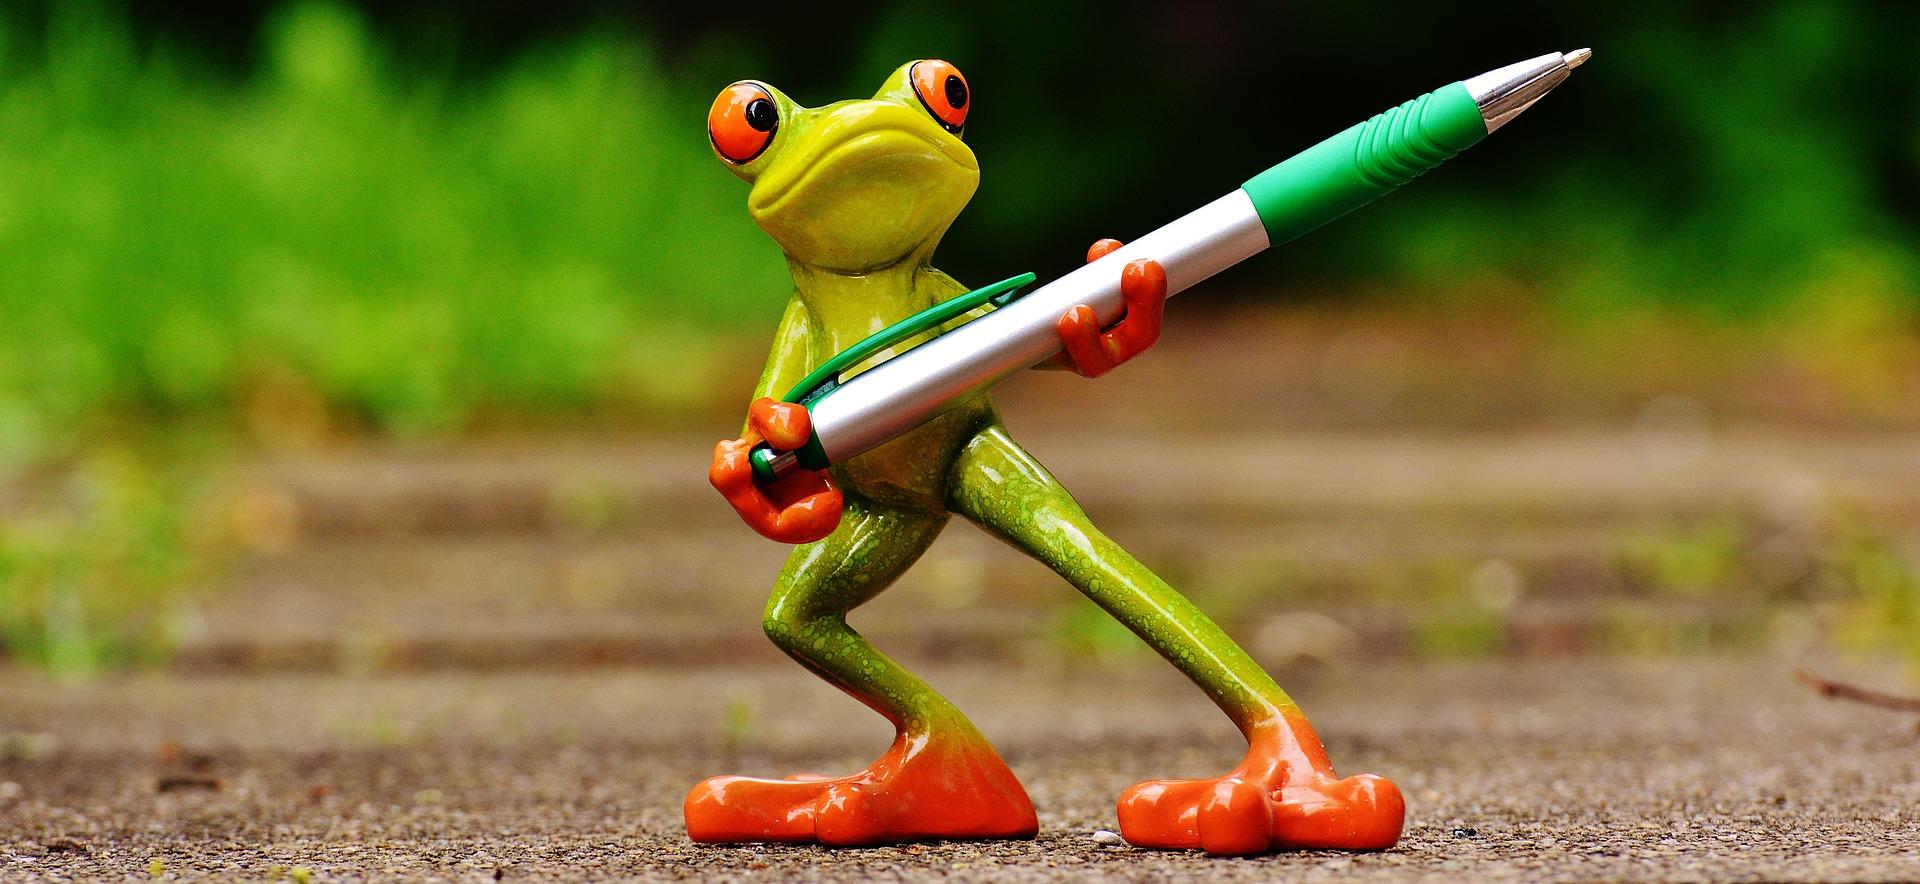 Frog holding a pen as a creative representation of transcreation